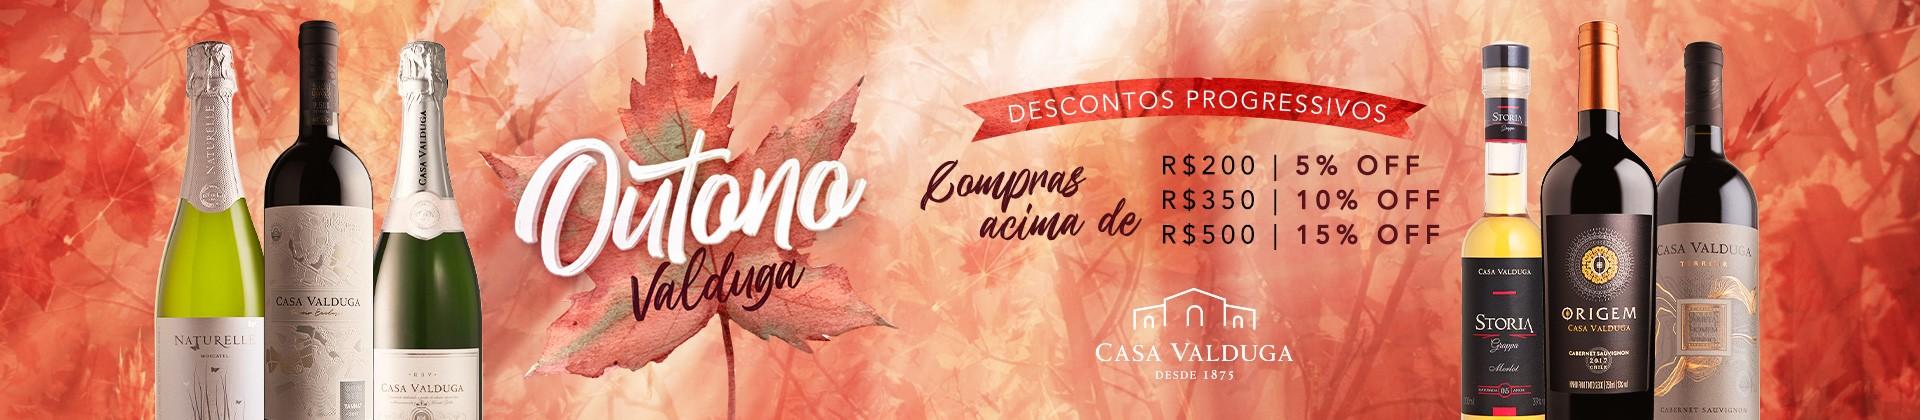 Banner principal Desconto progressivo Carnaval - Casa Valduga